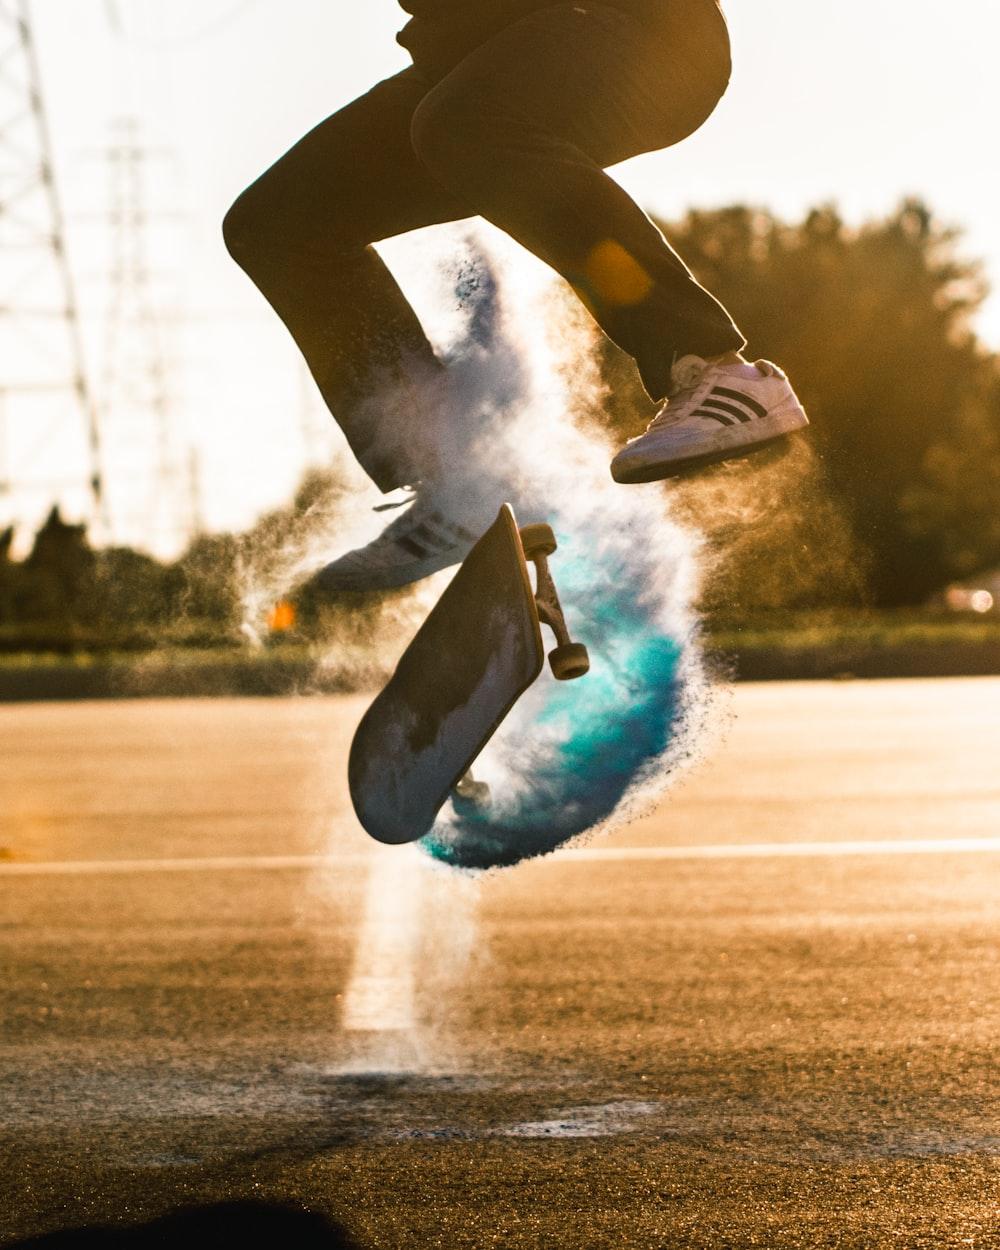 person skateboarding